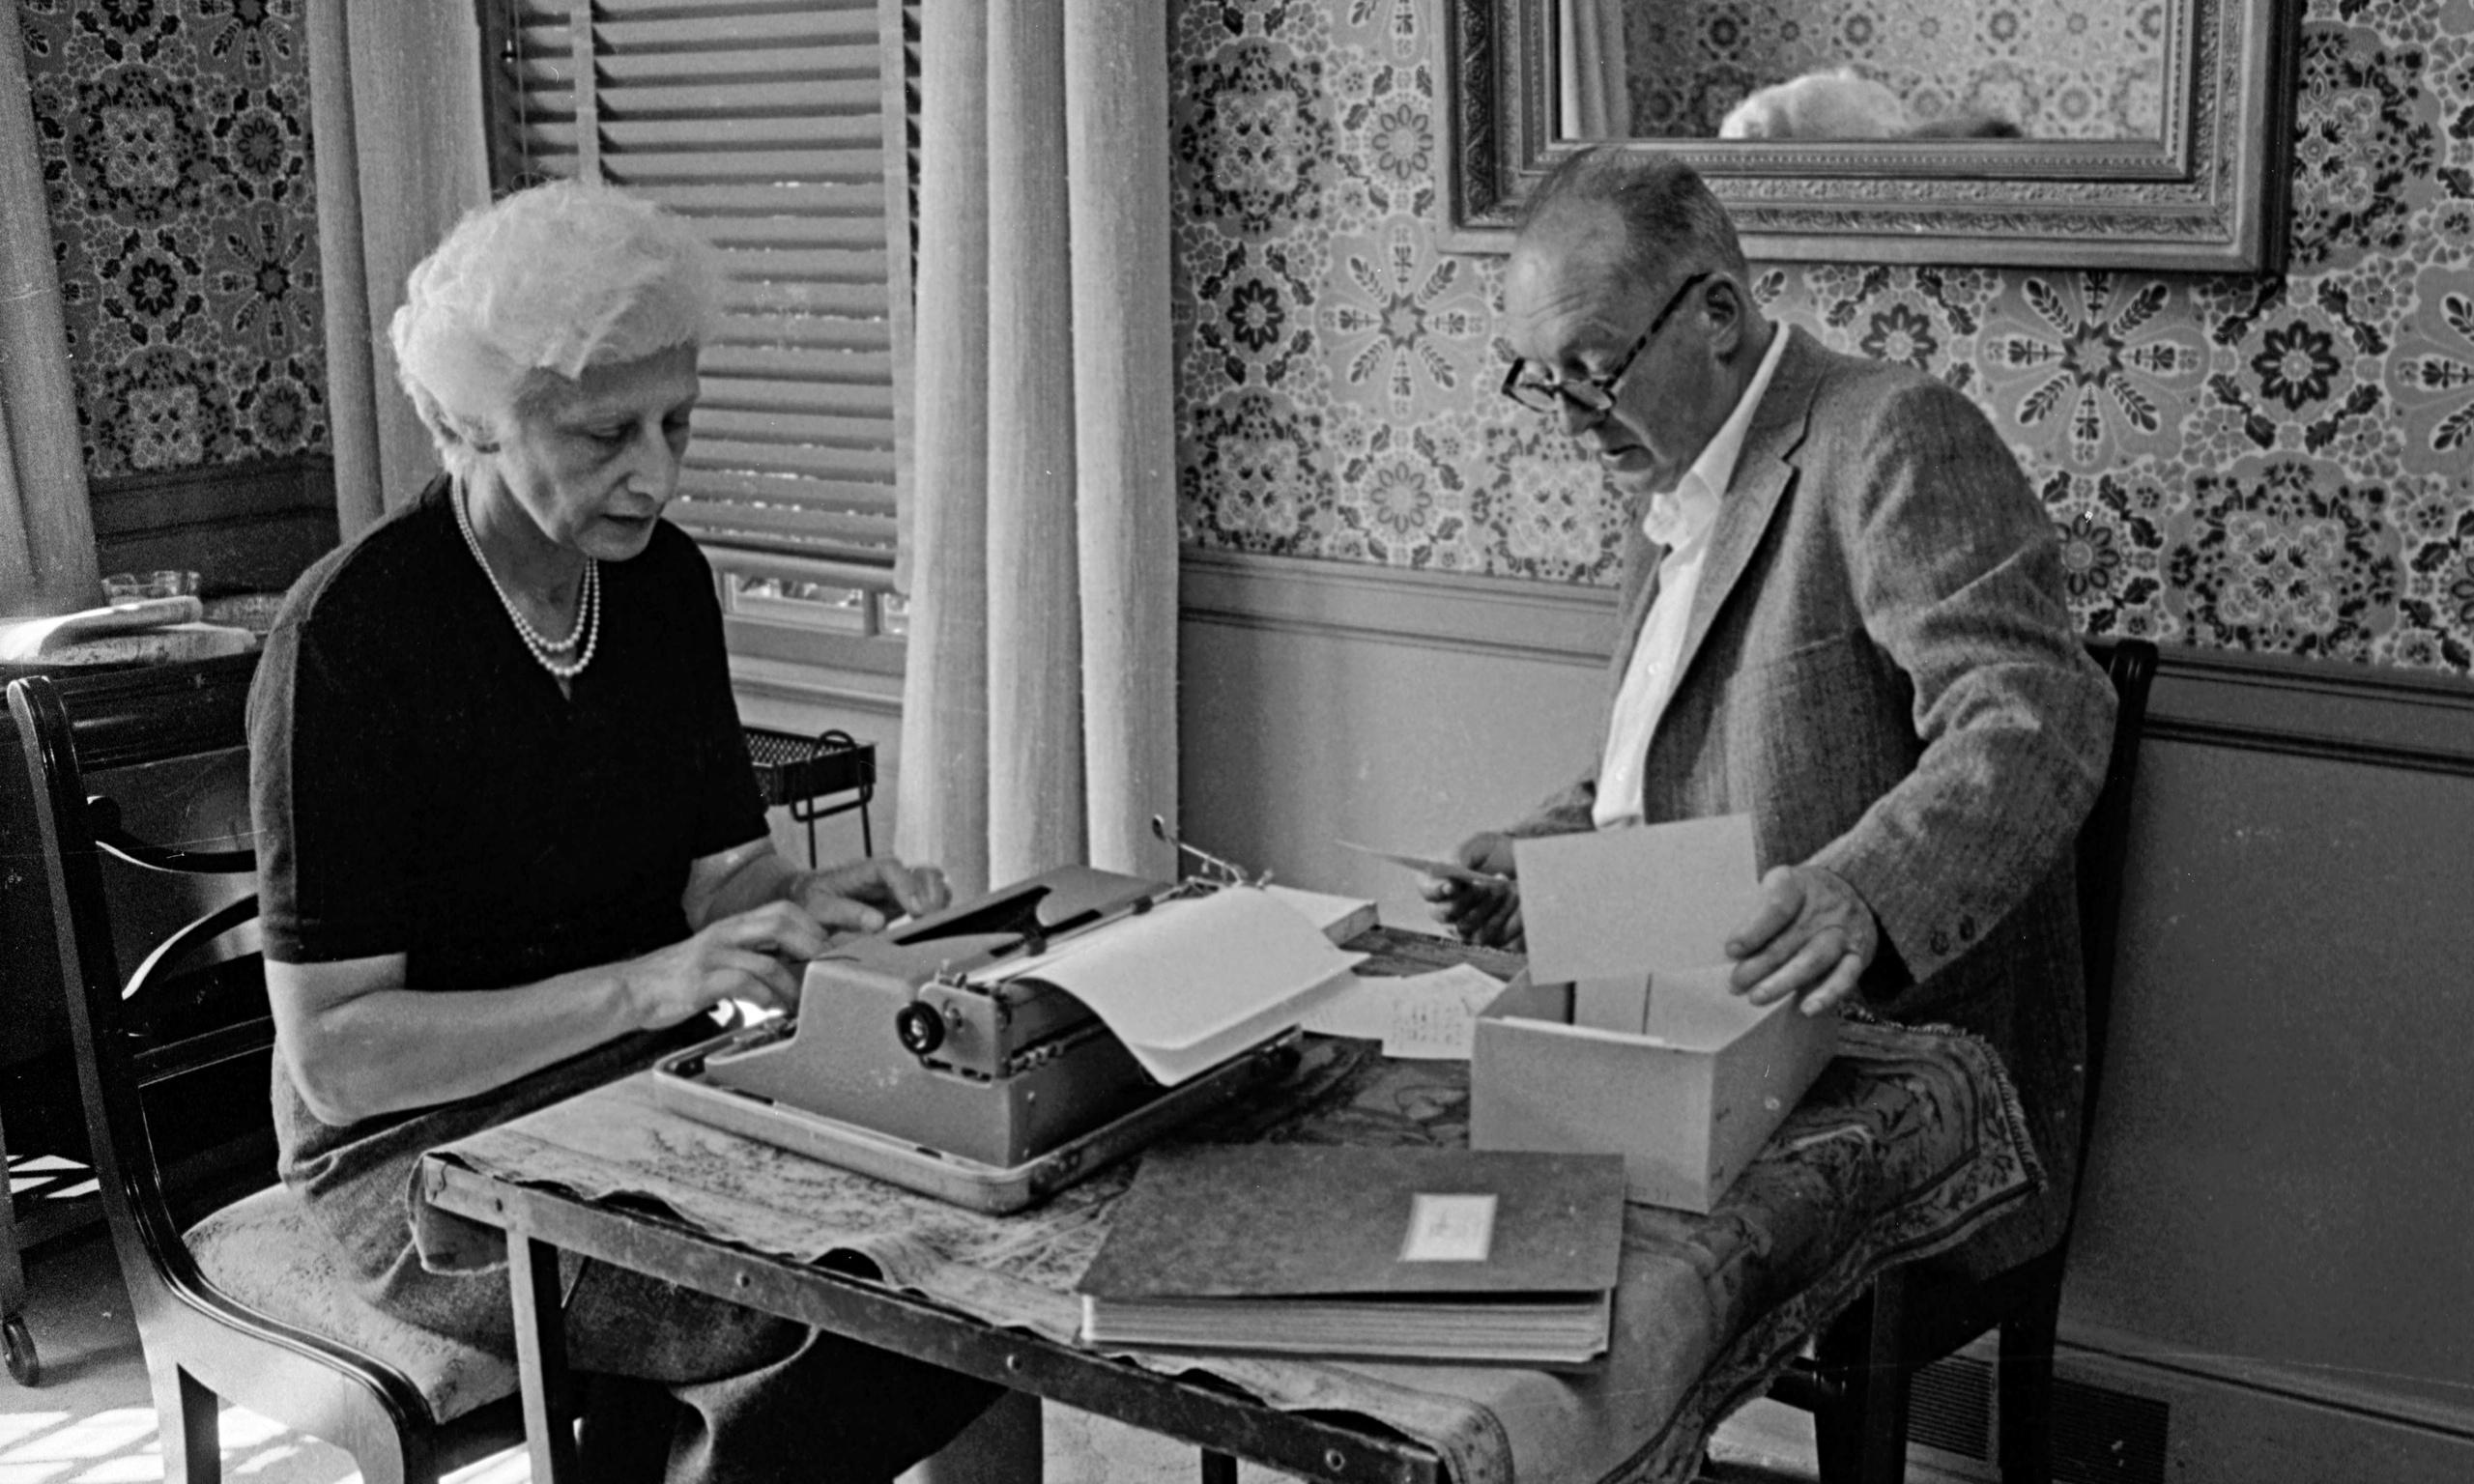 Vladimir Nabokov dictates while his wife Vera types, Ithaca New York, 1958